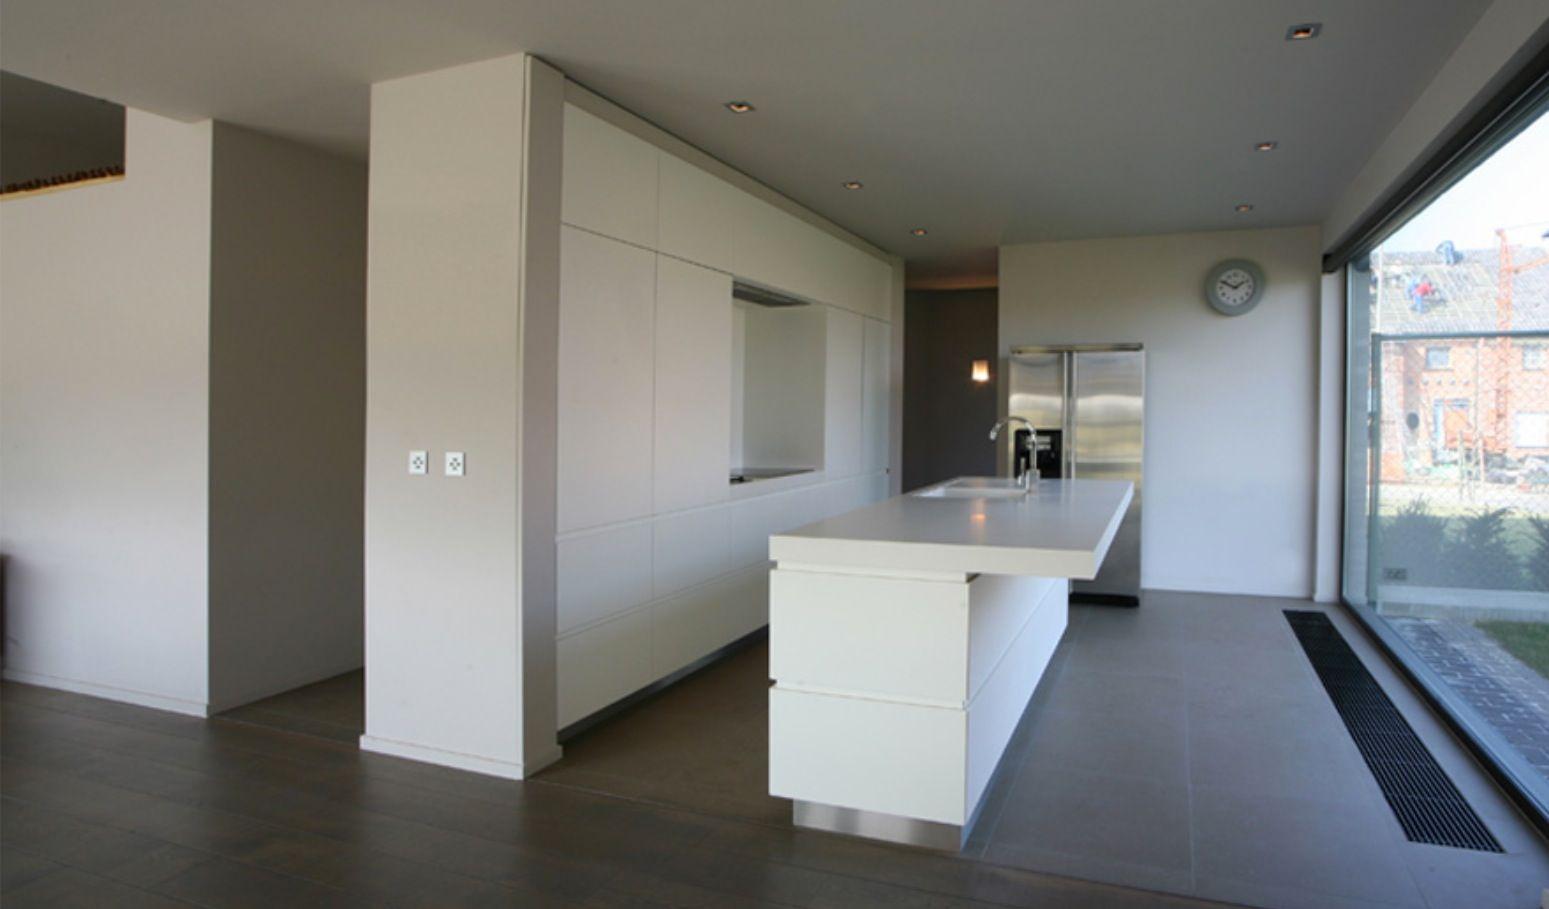 Open Keuken Ideeen : Keuken keuken ideeën keuken keuken ideeën en ideeën